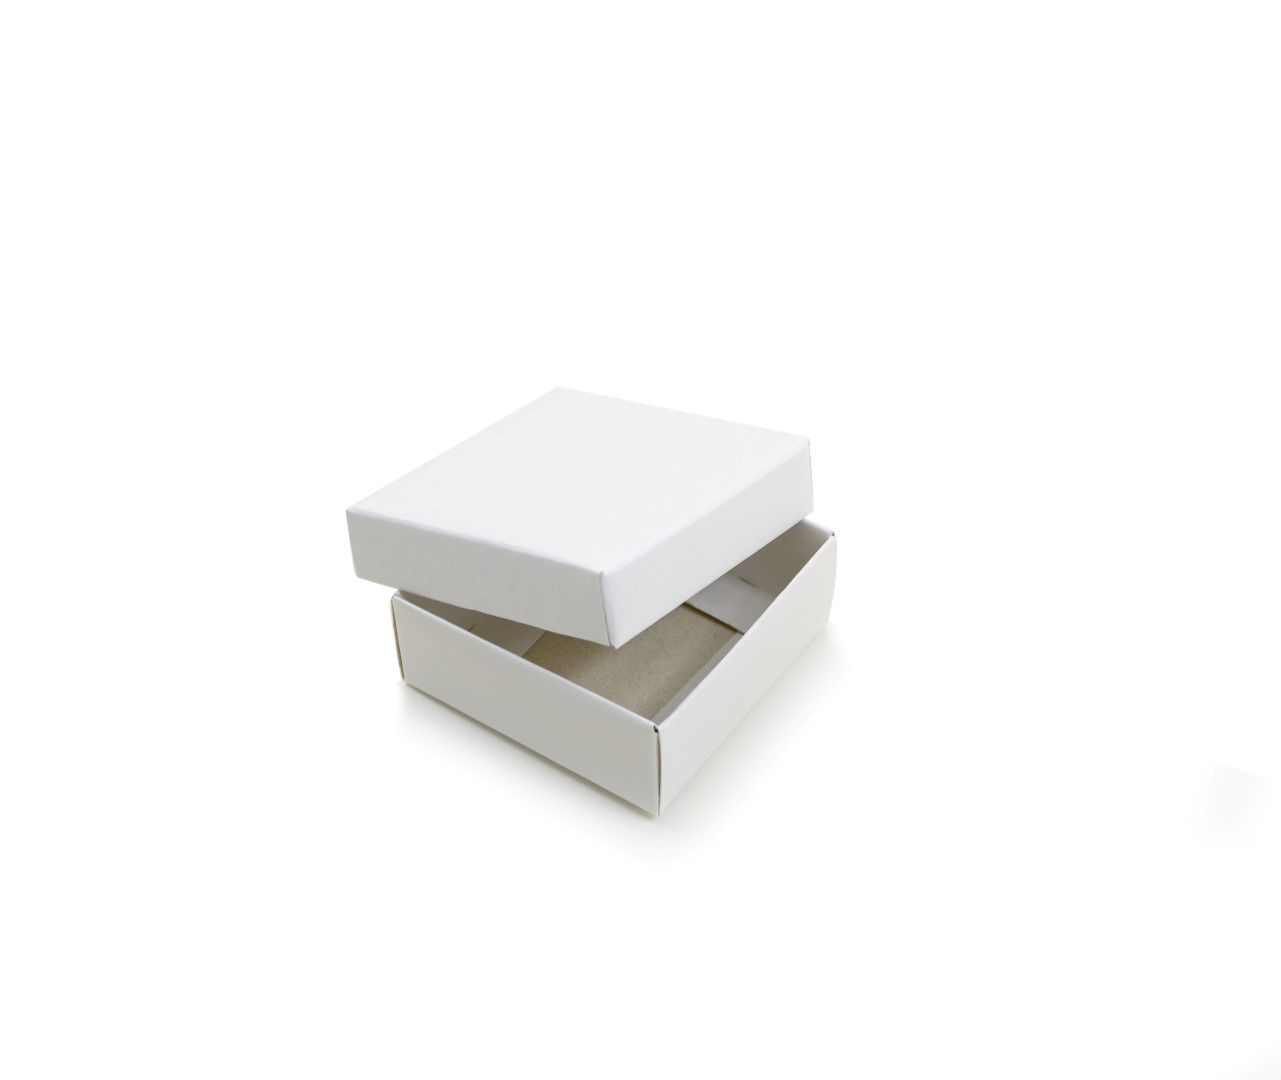 Ref 099 Branca - Caixa c/ Tampa Papel - 6x6x2,5 cm - c/ 10 unidades